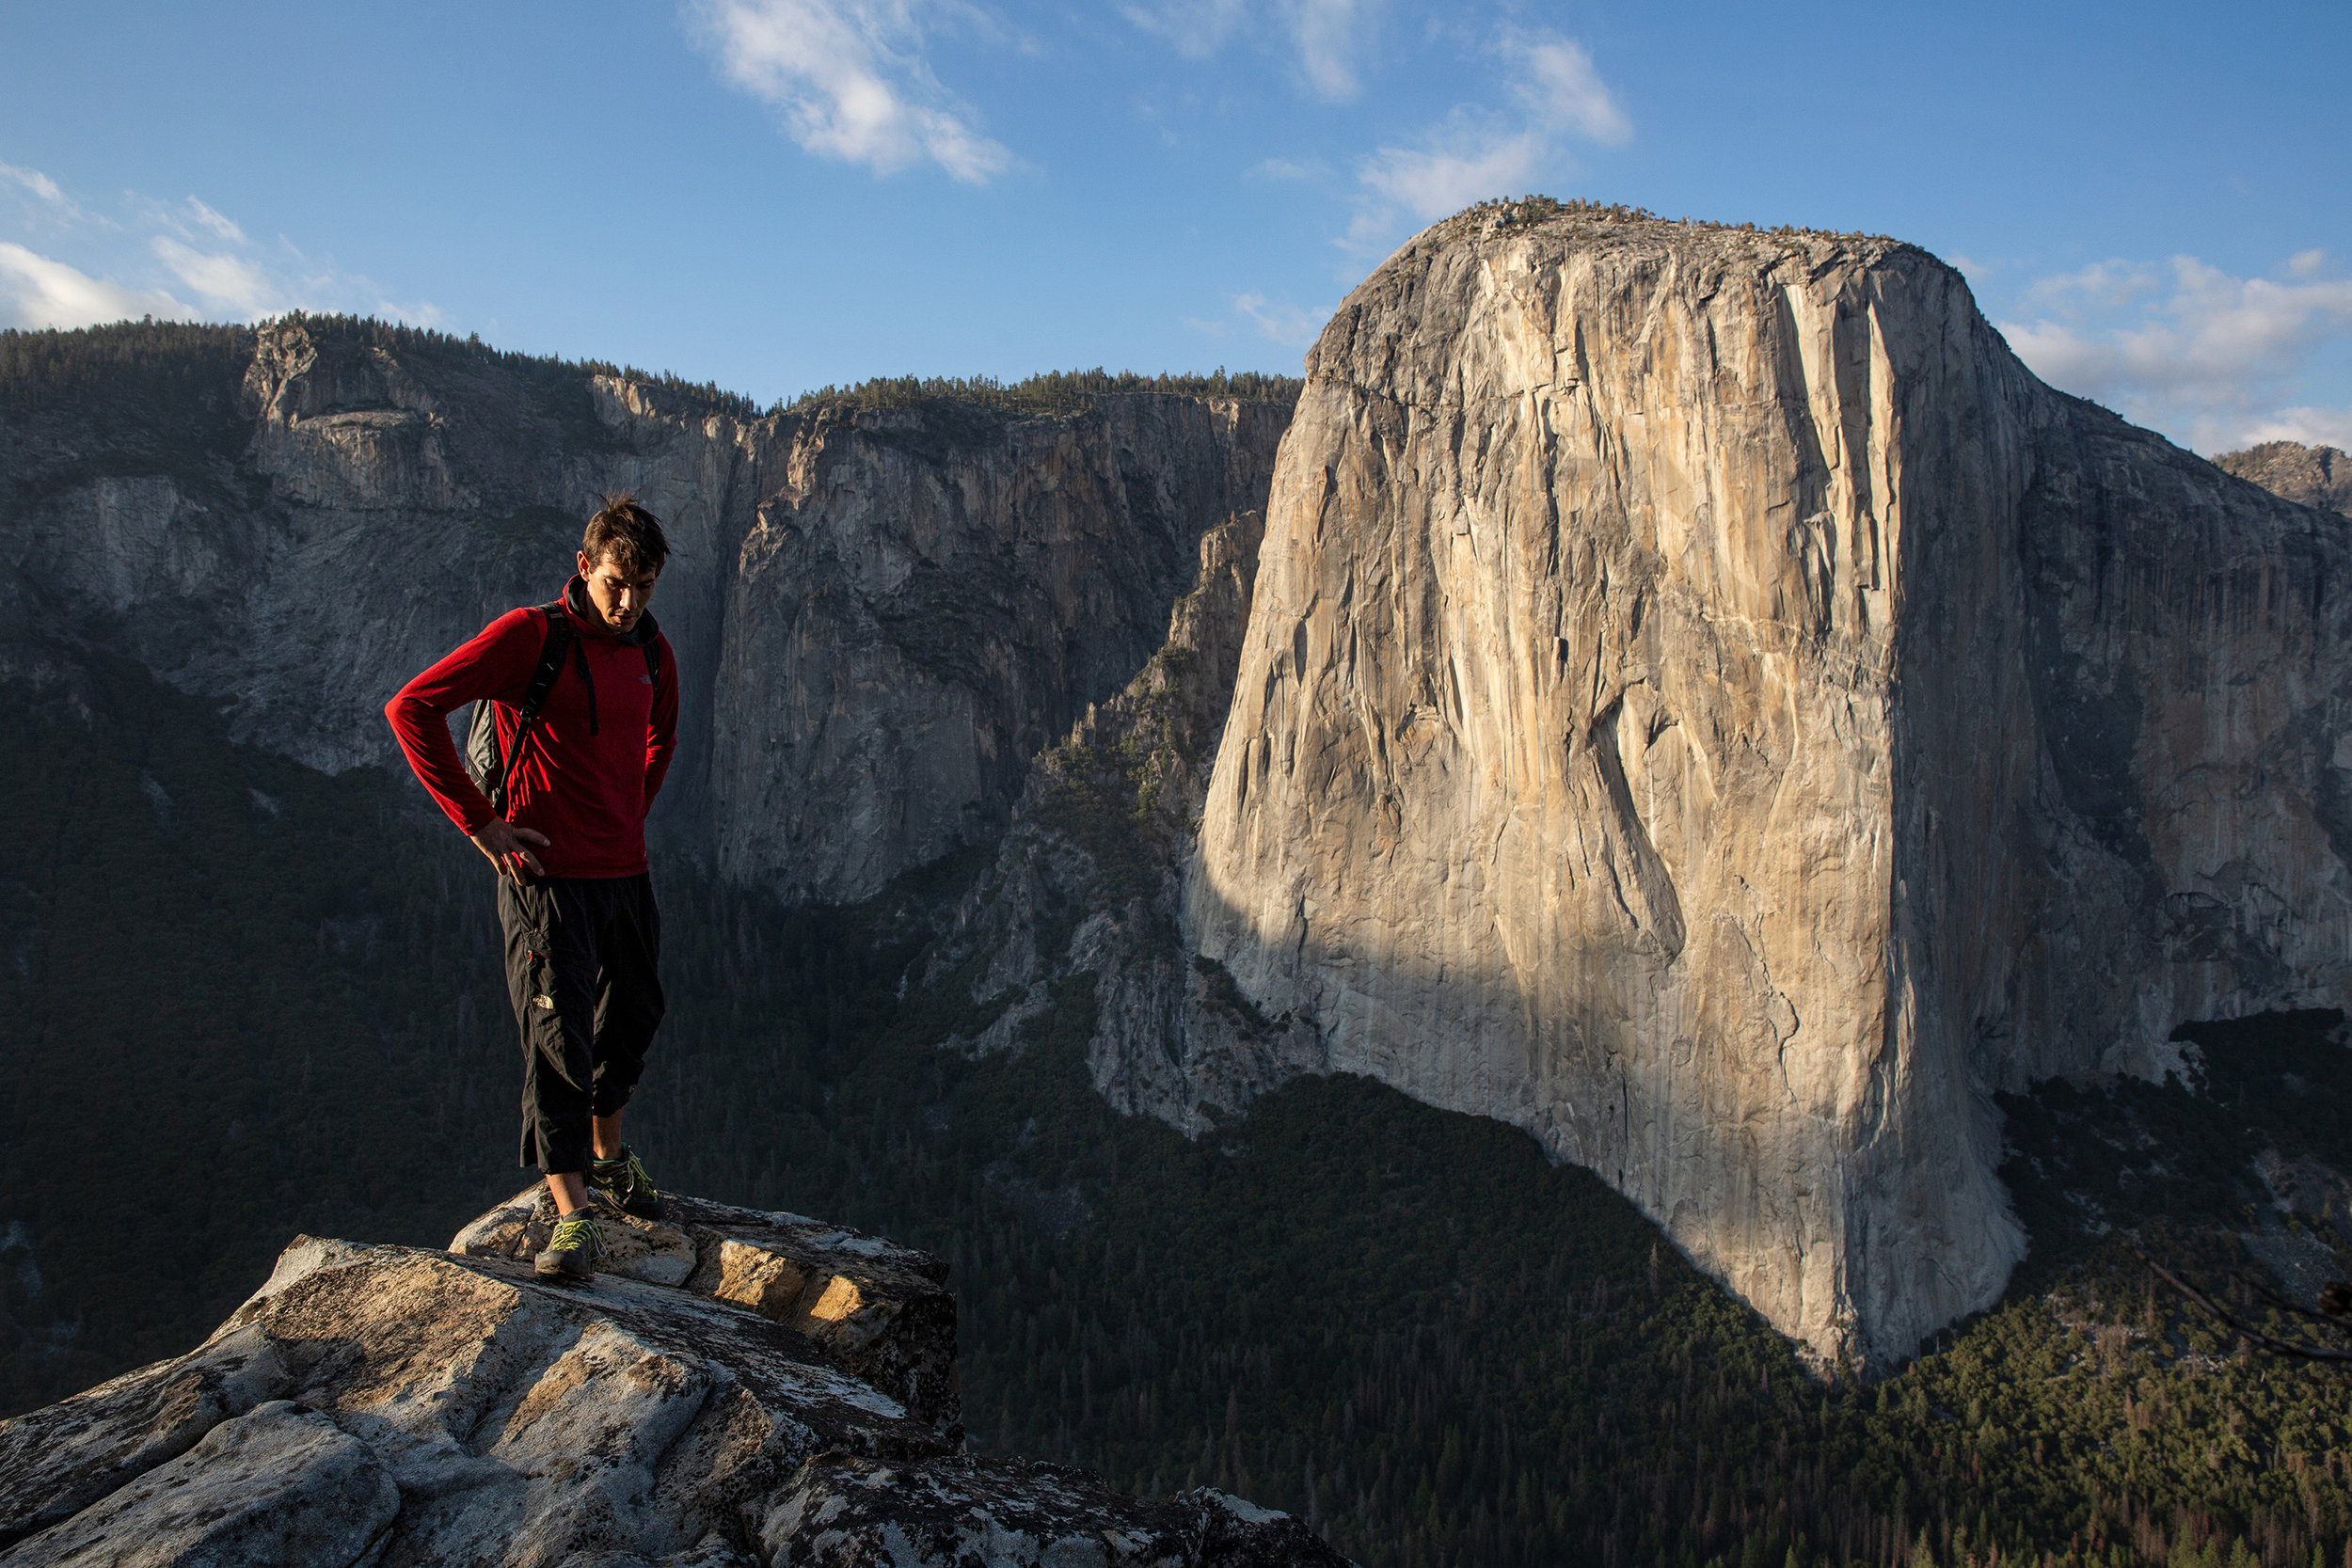 Alex Honnold in front of El Capitan